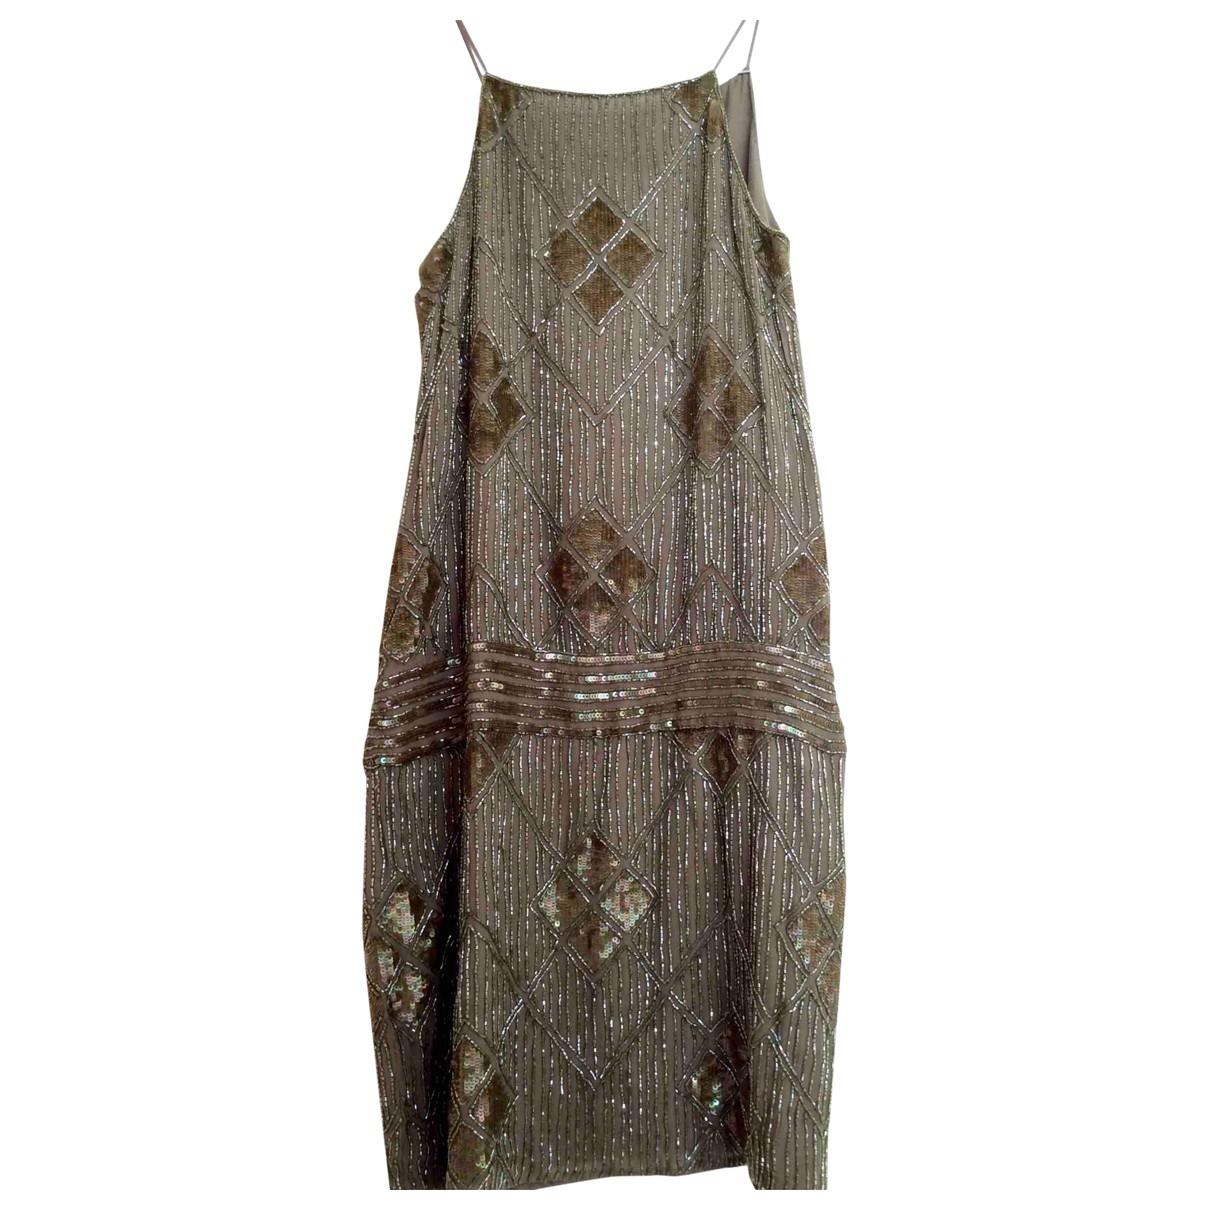 Massimo Dutti \N Kleid in  Khaki Mit Pailletten